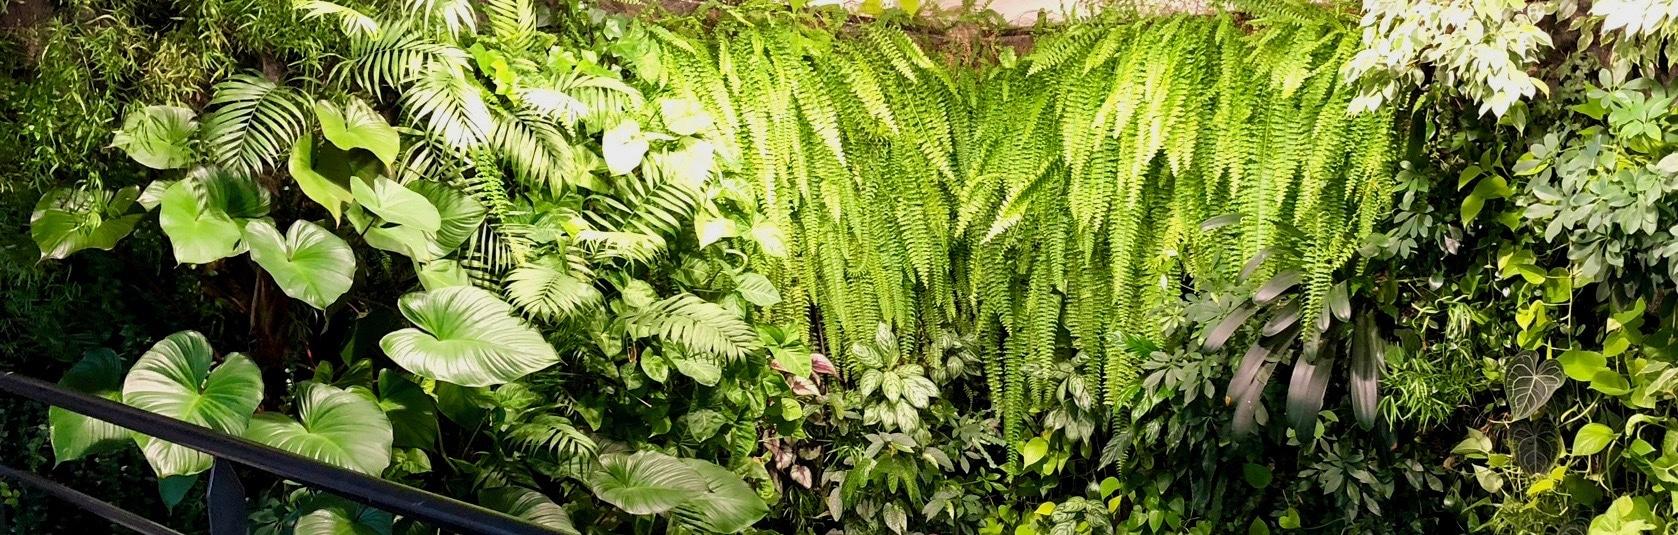 mur vegetal naturel